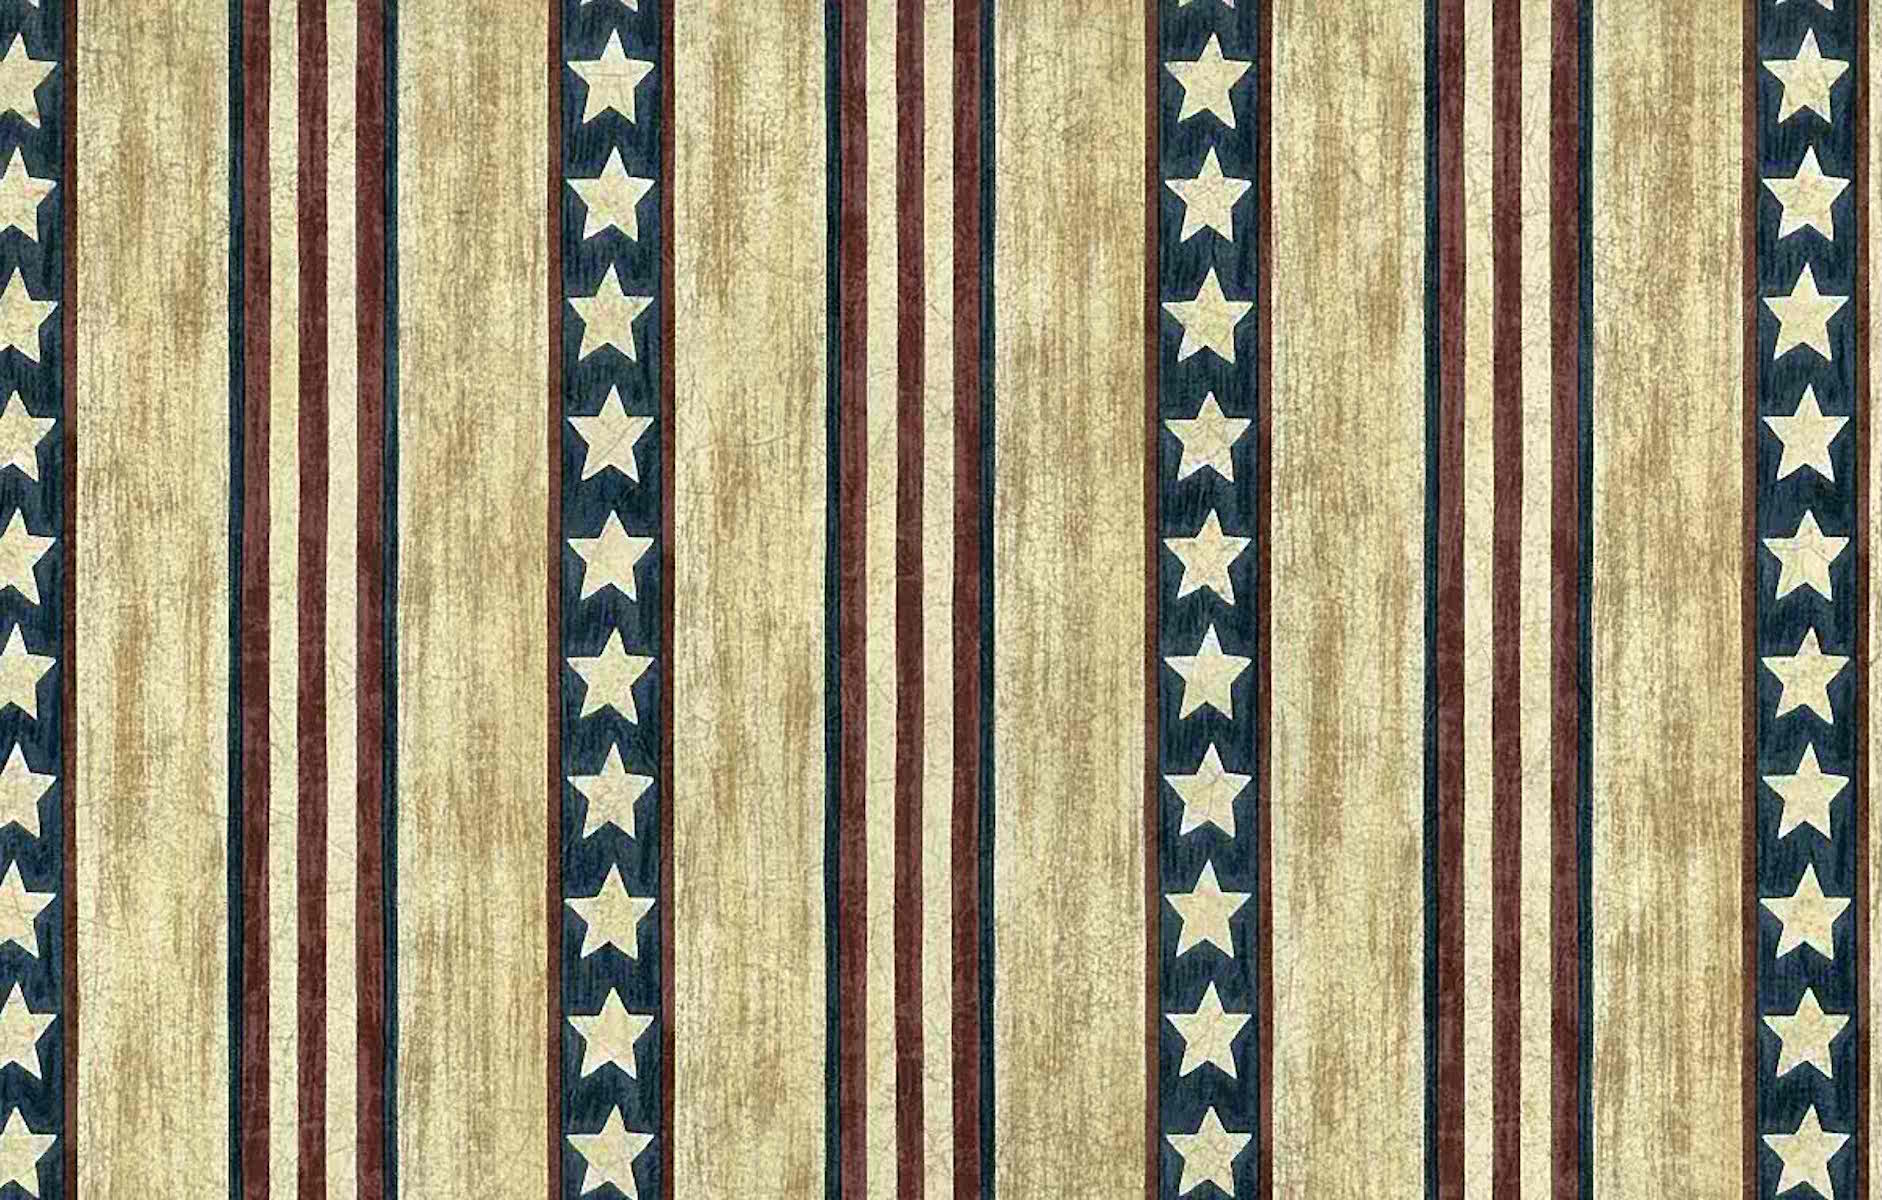 Striped Vintage Wallpaper Americana Stars Stripes Tan Blue ...